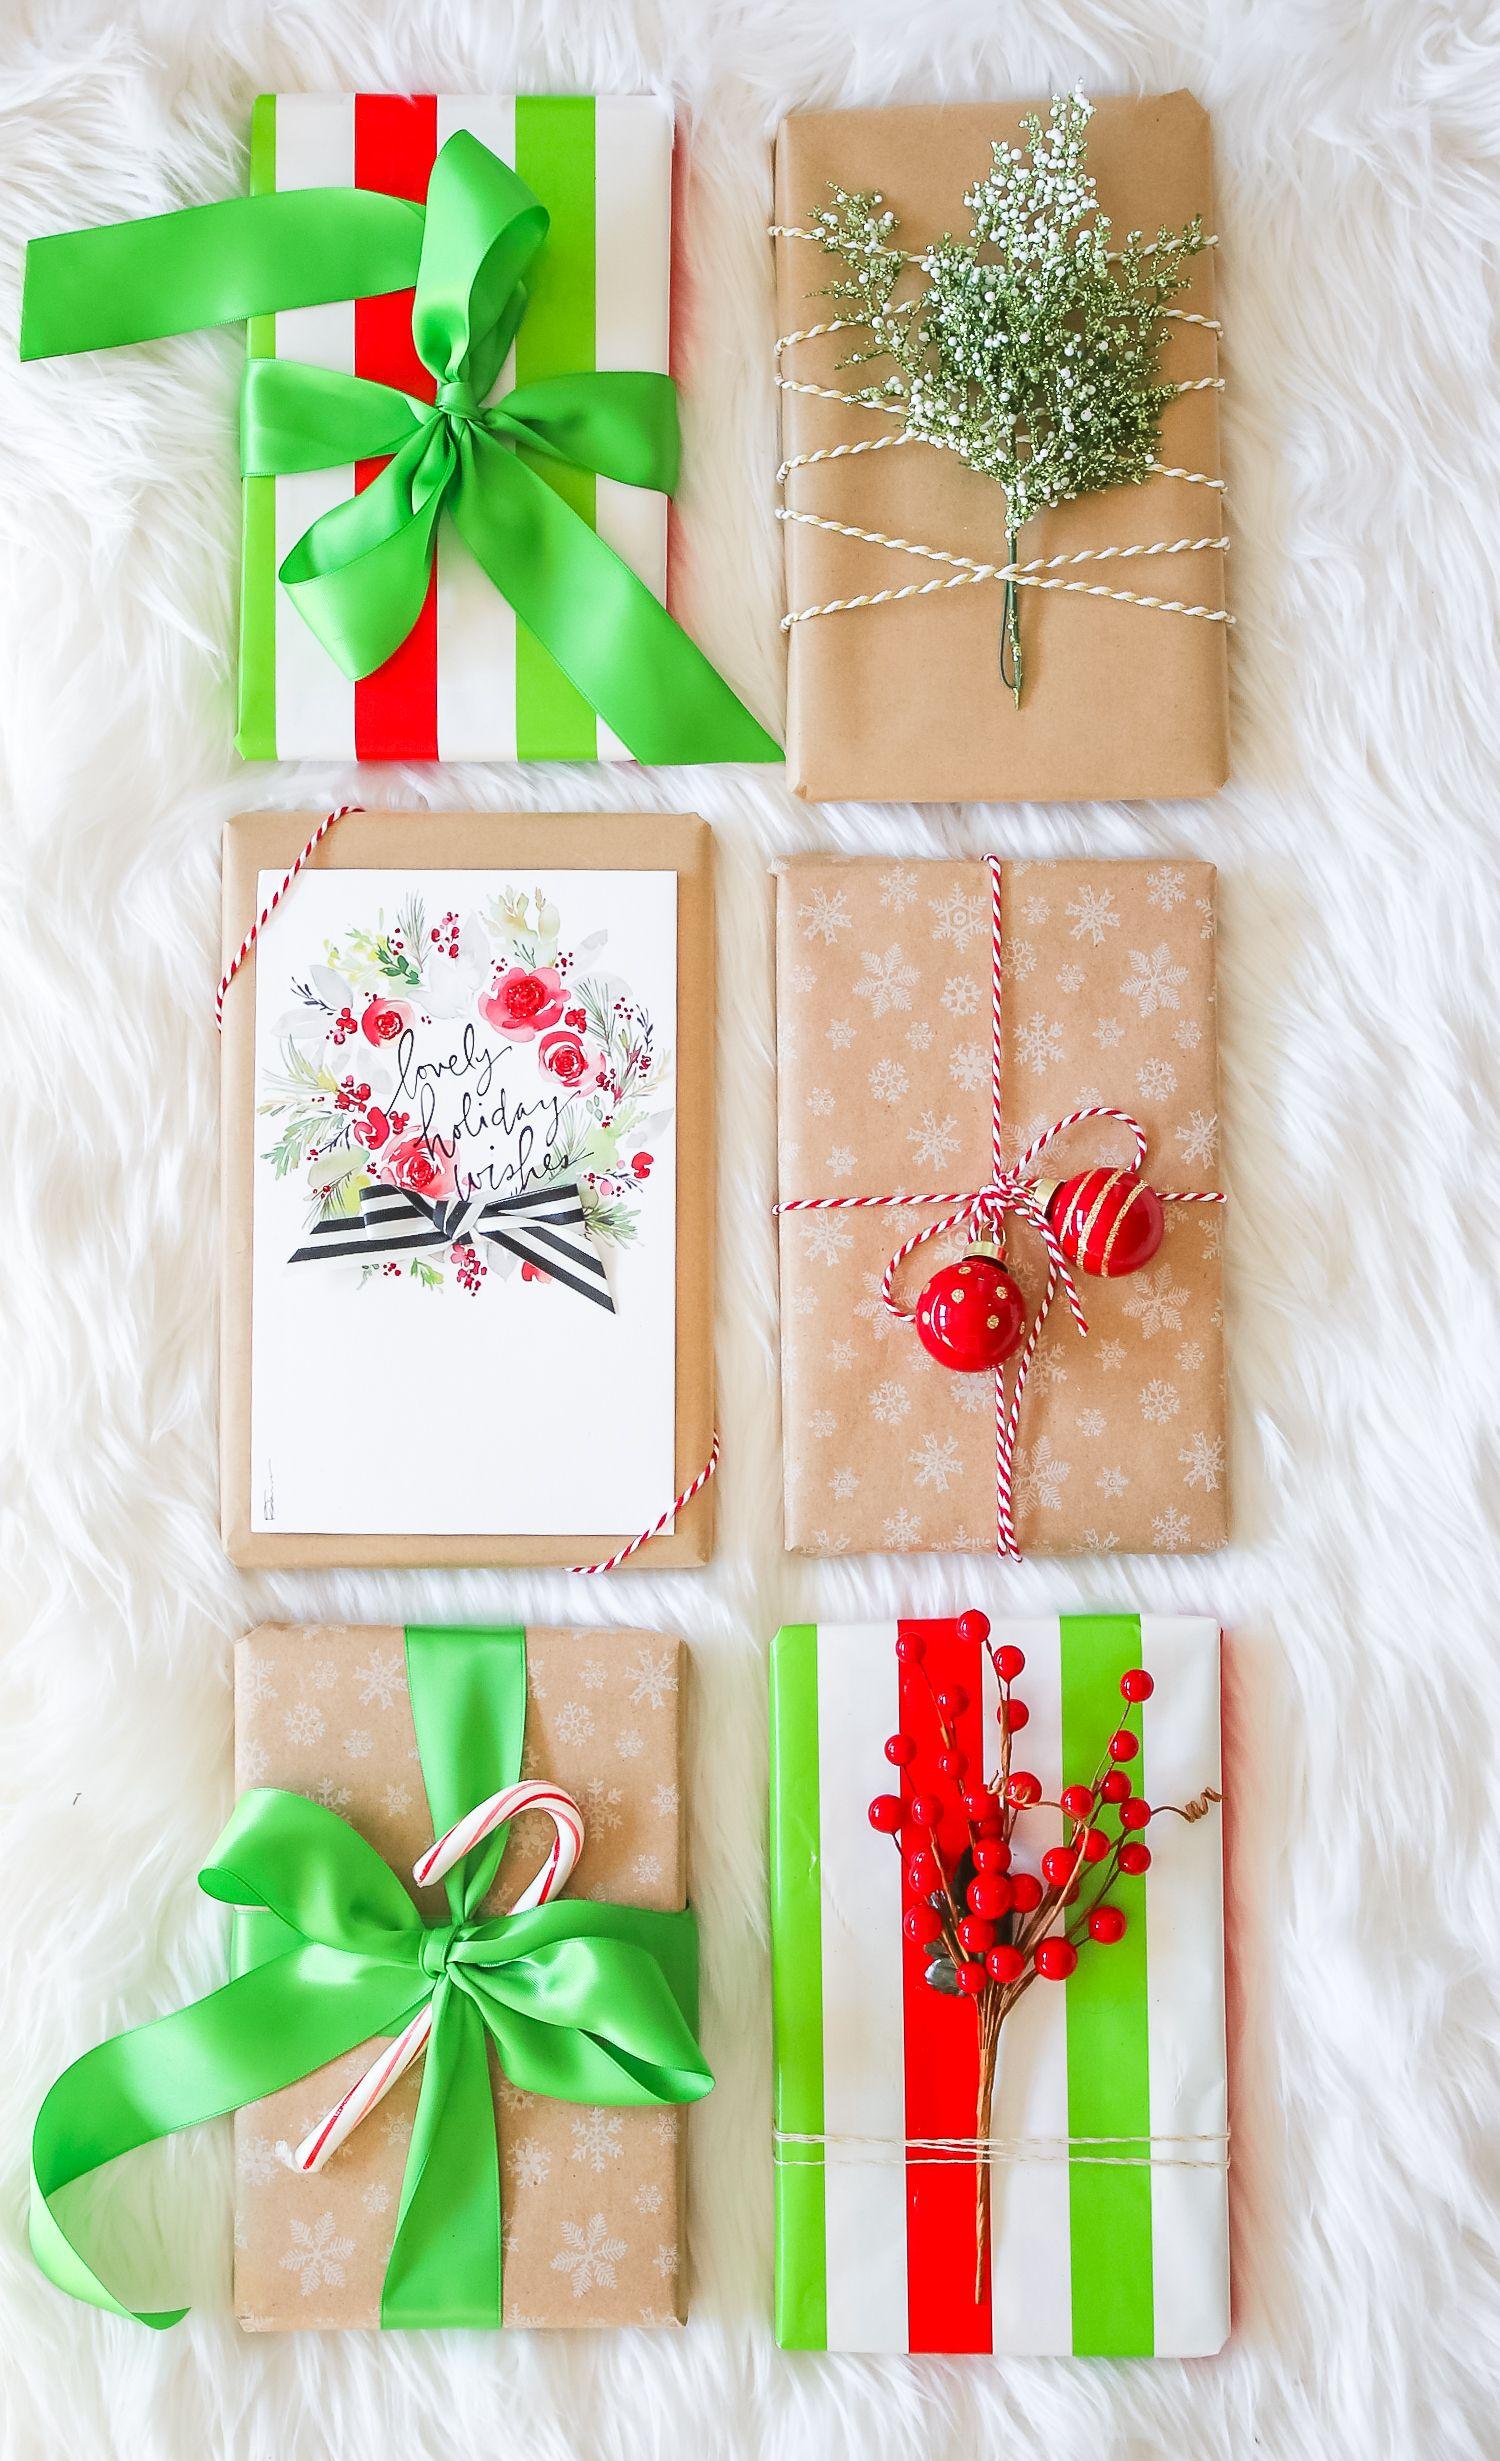 Elegant Holiday Gift Wrap Ideas | Gift wrapping ideas | Pinterest ...